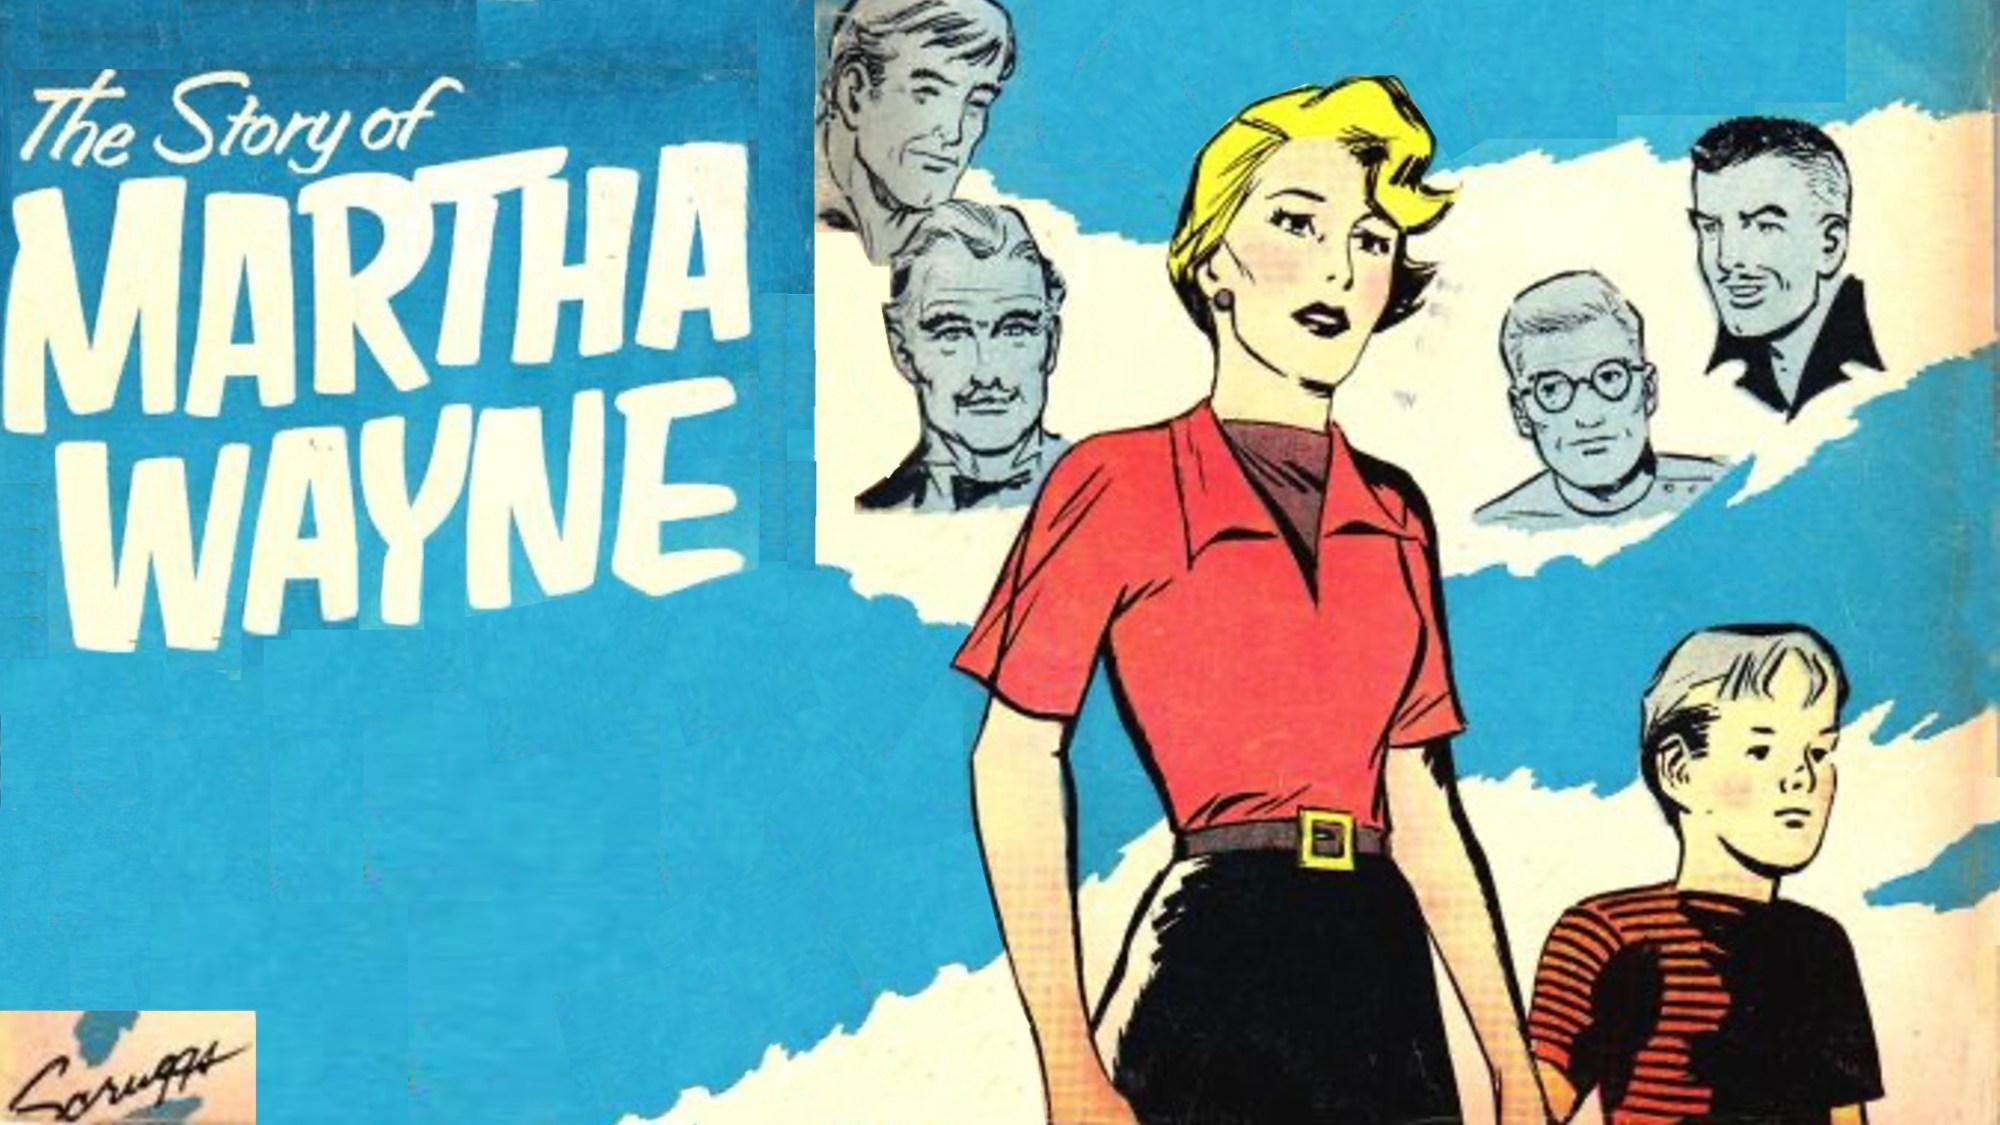 The Story of Martha Wayne